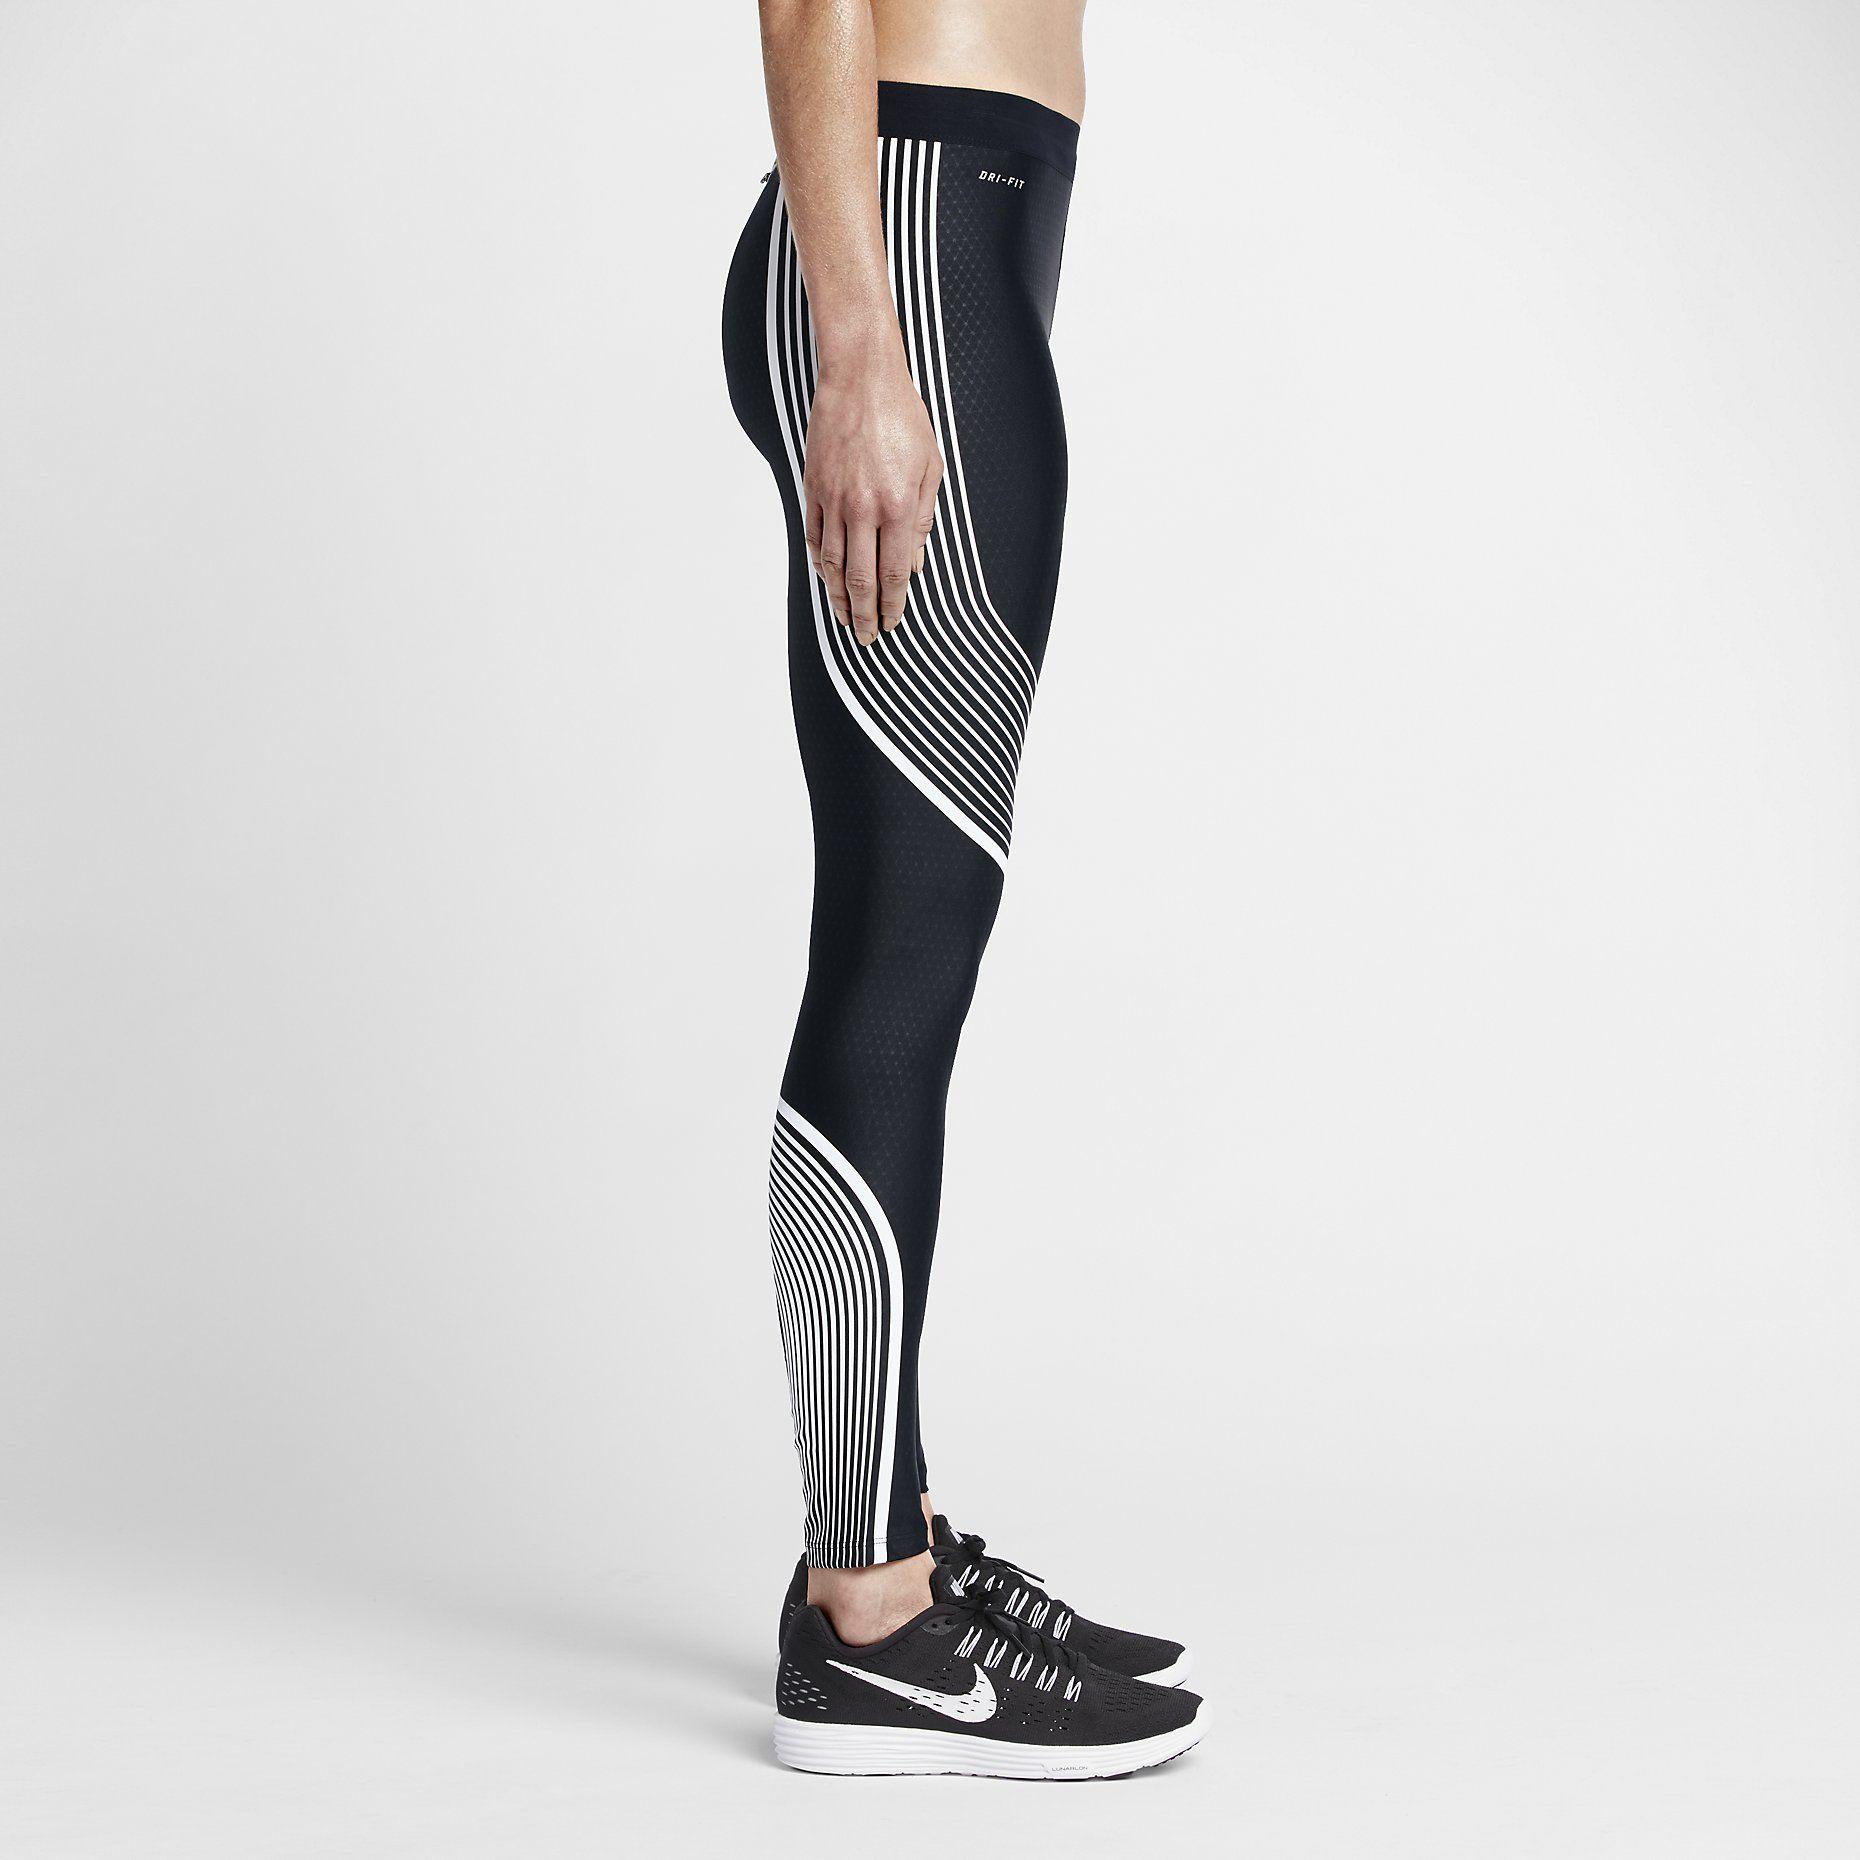 Nike Power Speed Damen-Lauftights 125